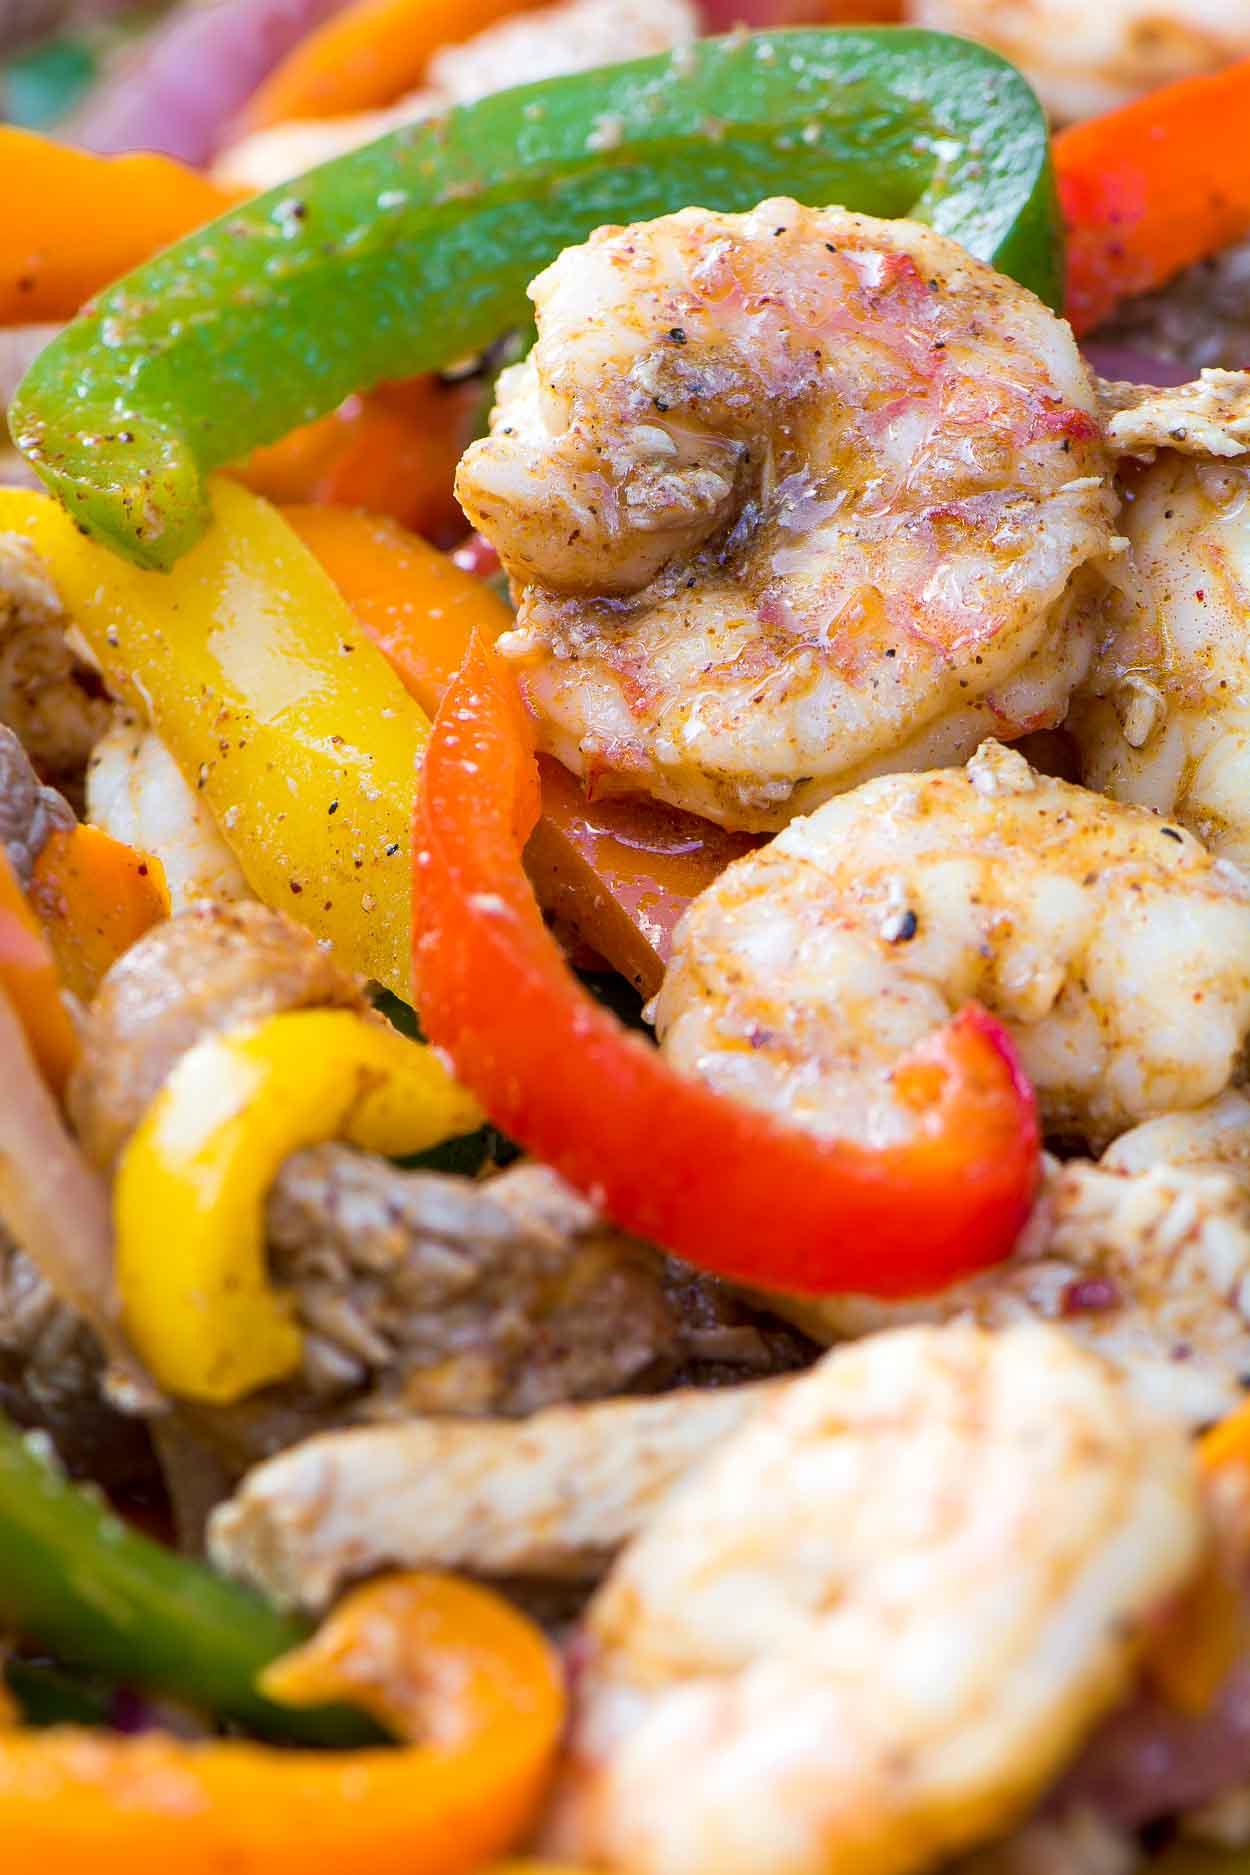 Sizzlin' Shrimp, Chicken and Steak Fajitas